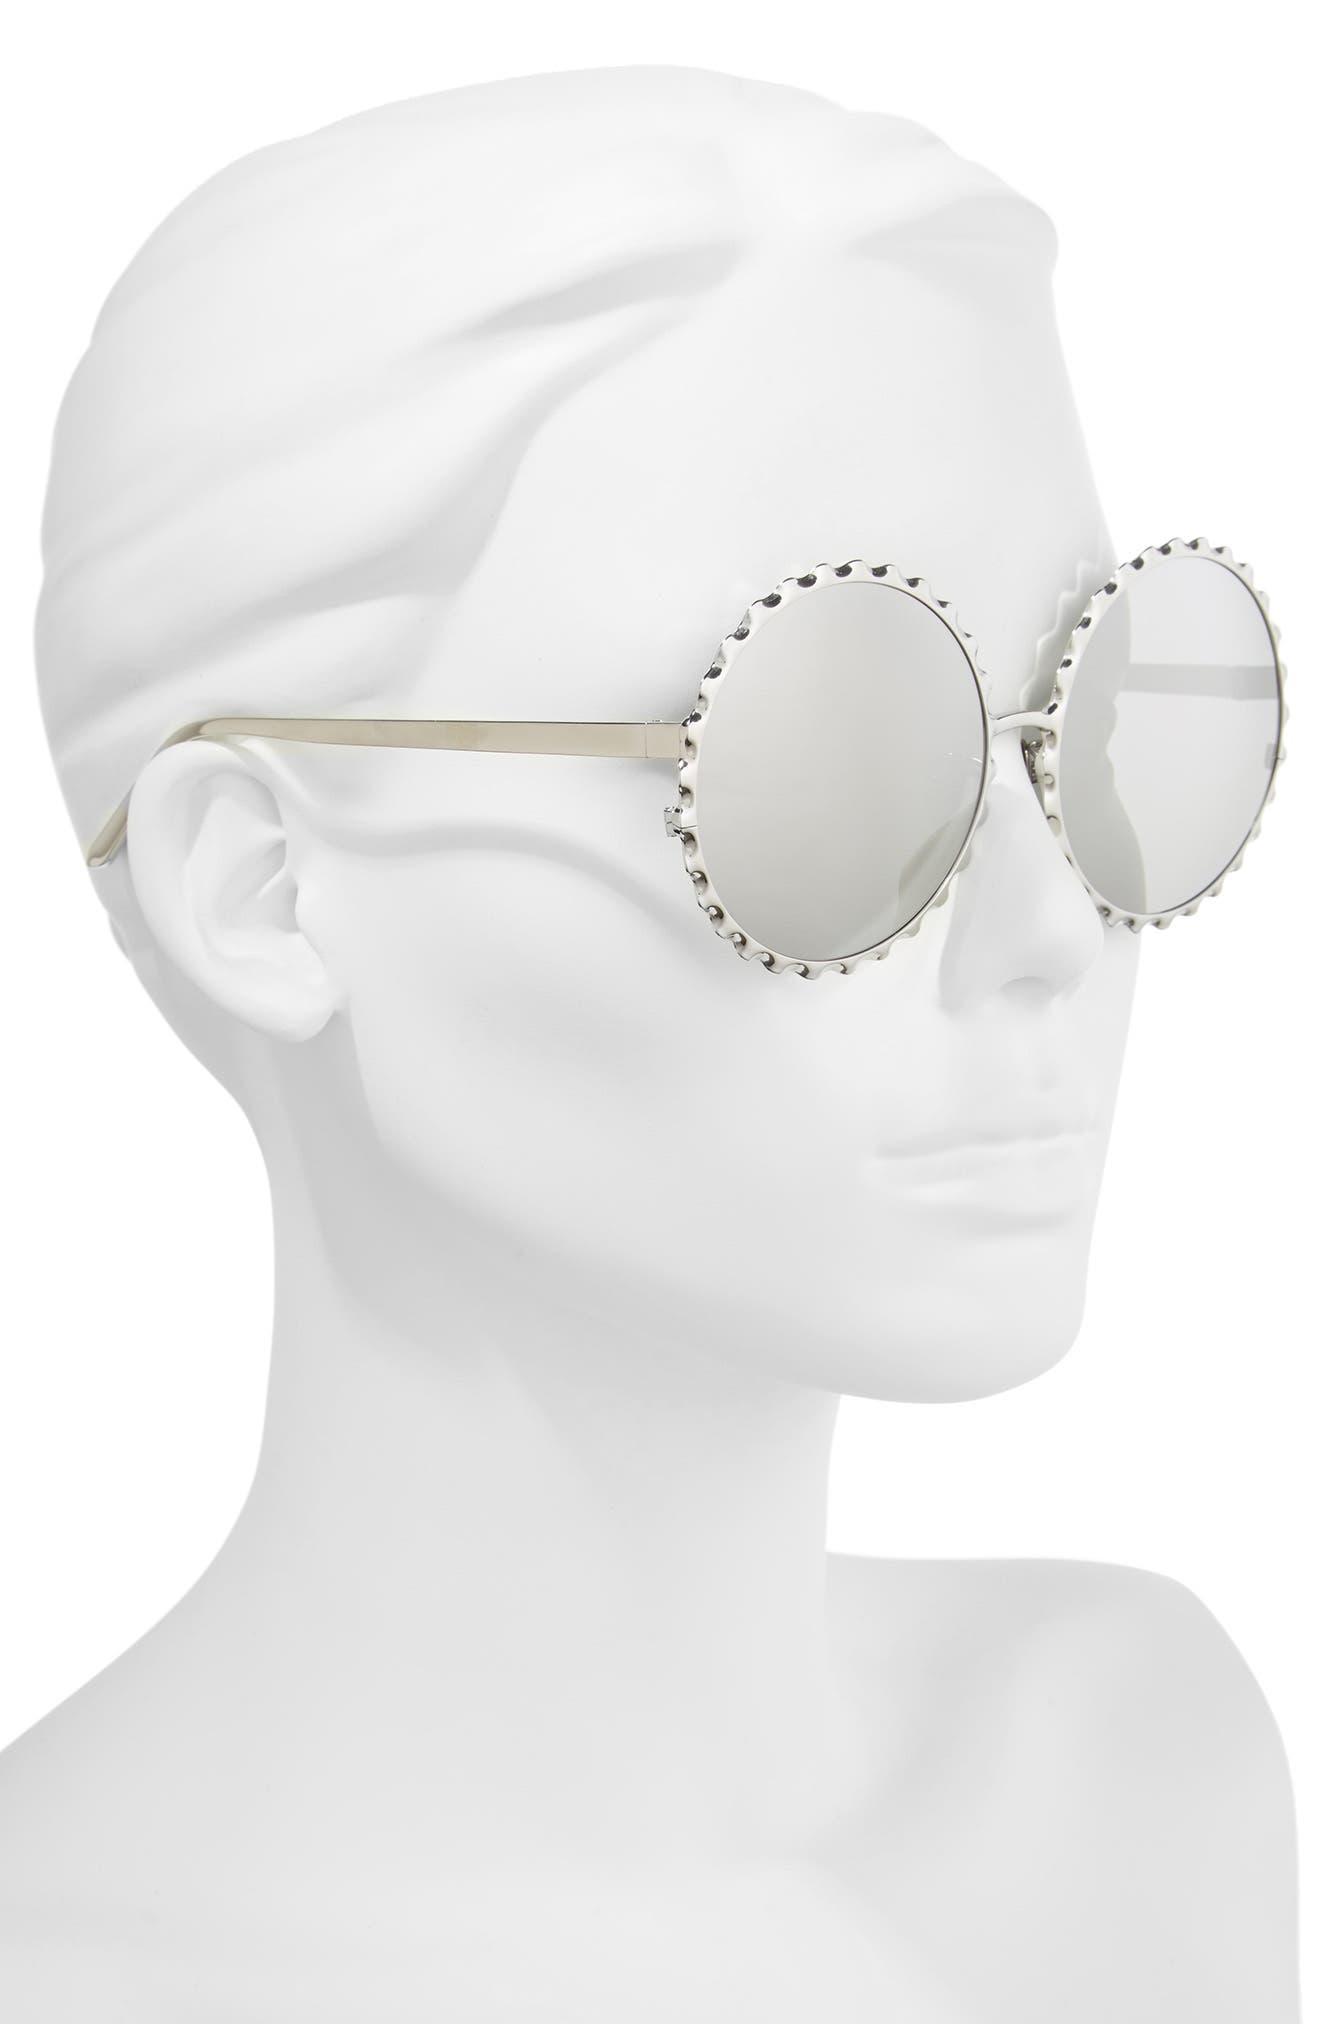 59mm Mirrored 18 Karat Gold Trim Round Sunglasses,                             Alternate thumbnail 2, color,                             White Gold/ Platinum